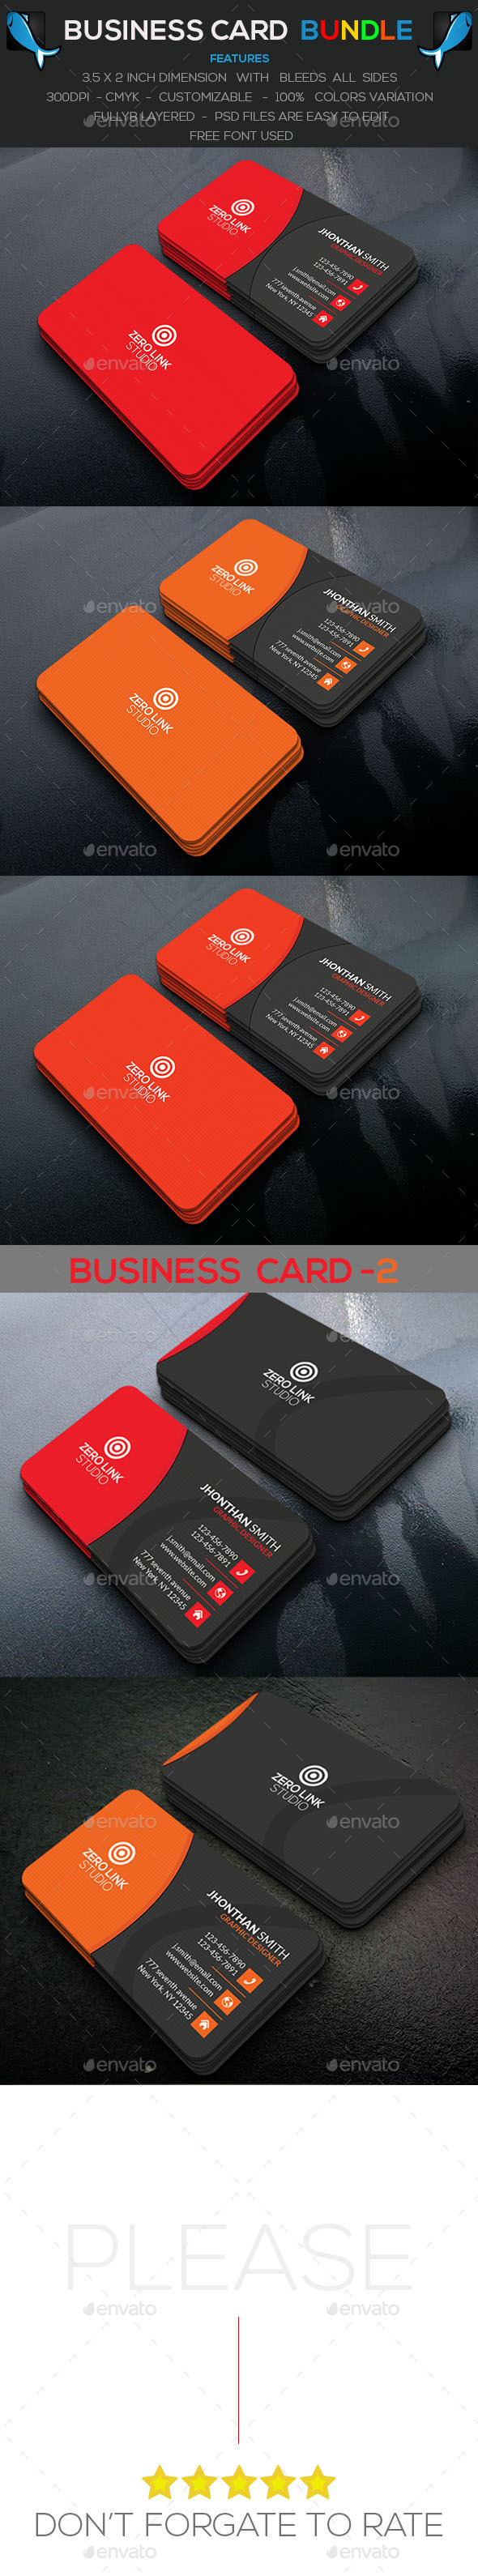 Corporate Business Card Bundle Color - Corporate Business Cards